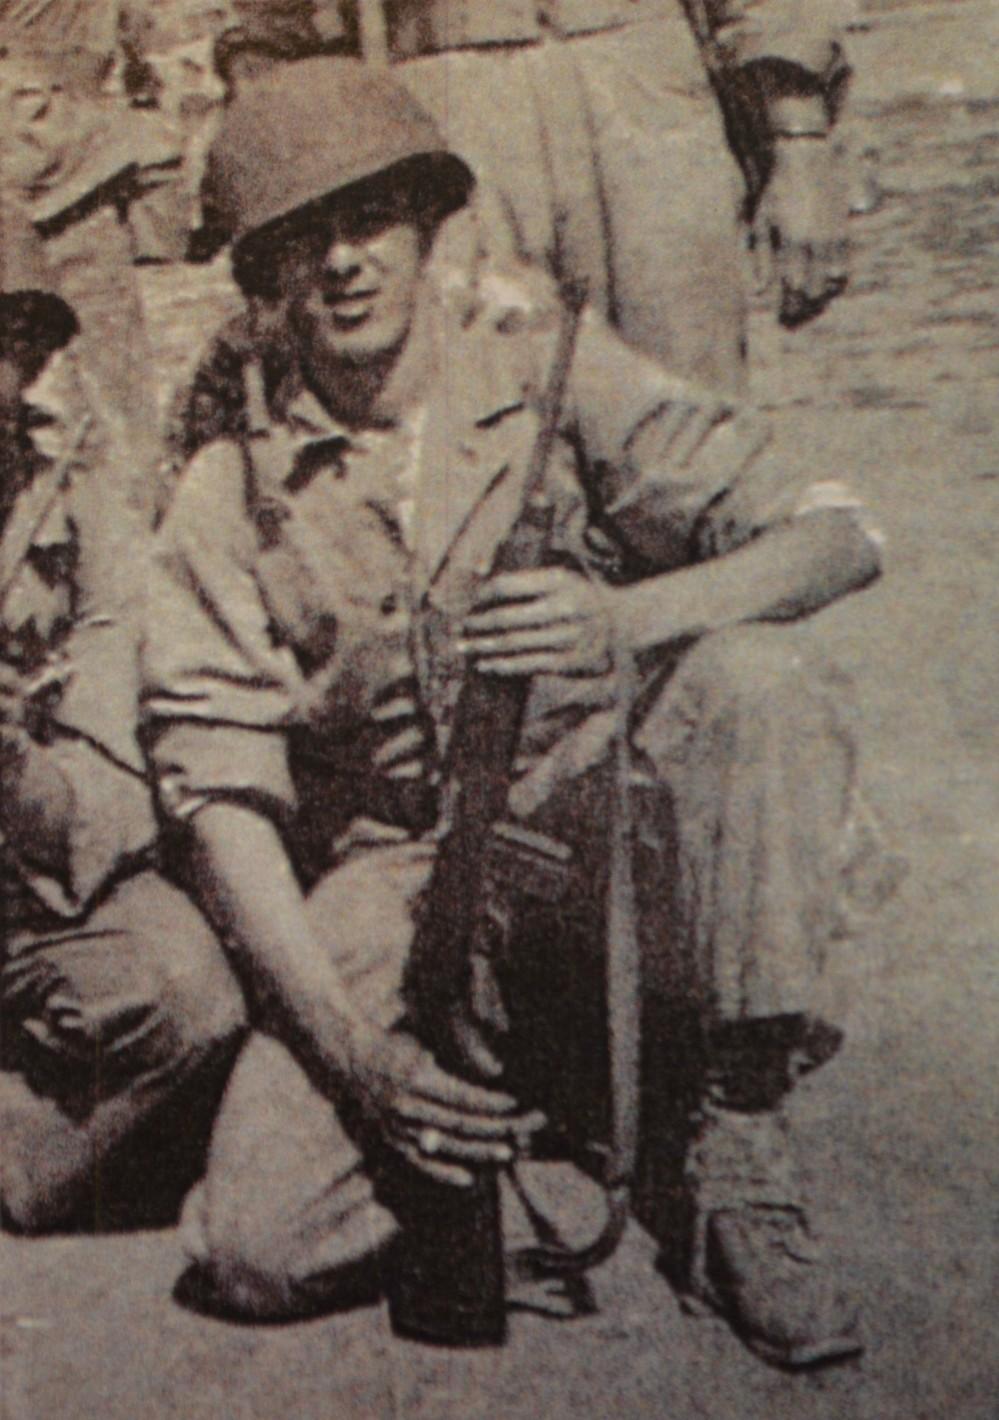 James with M1 Carbine: Camp Pendleton, CA 1944